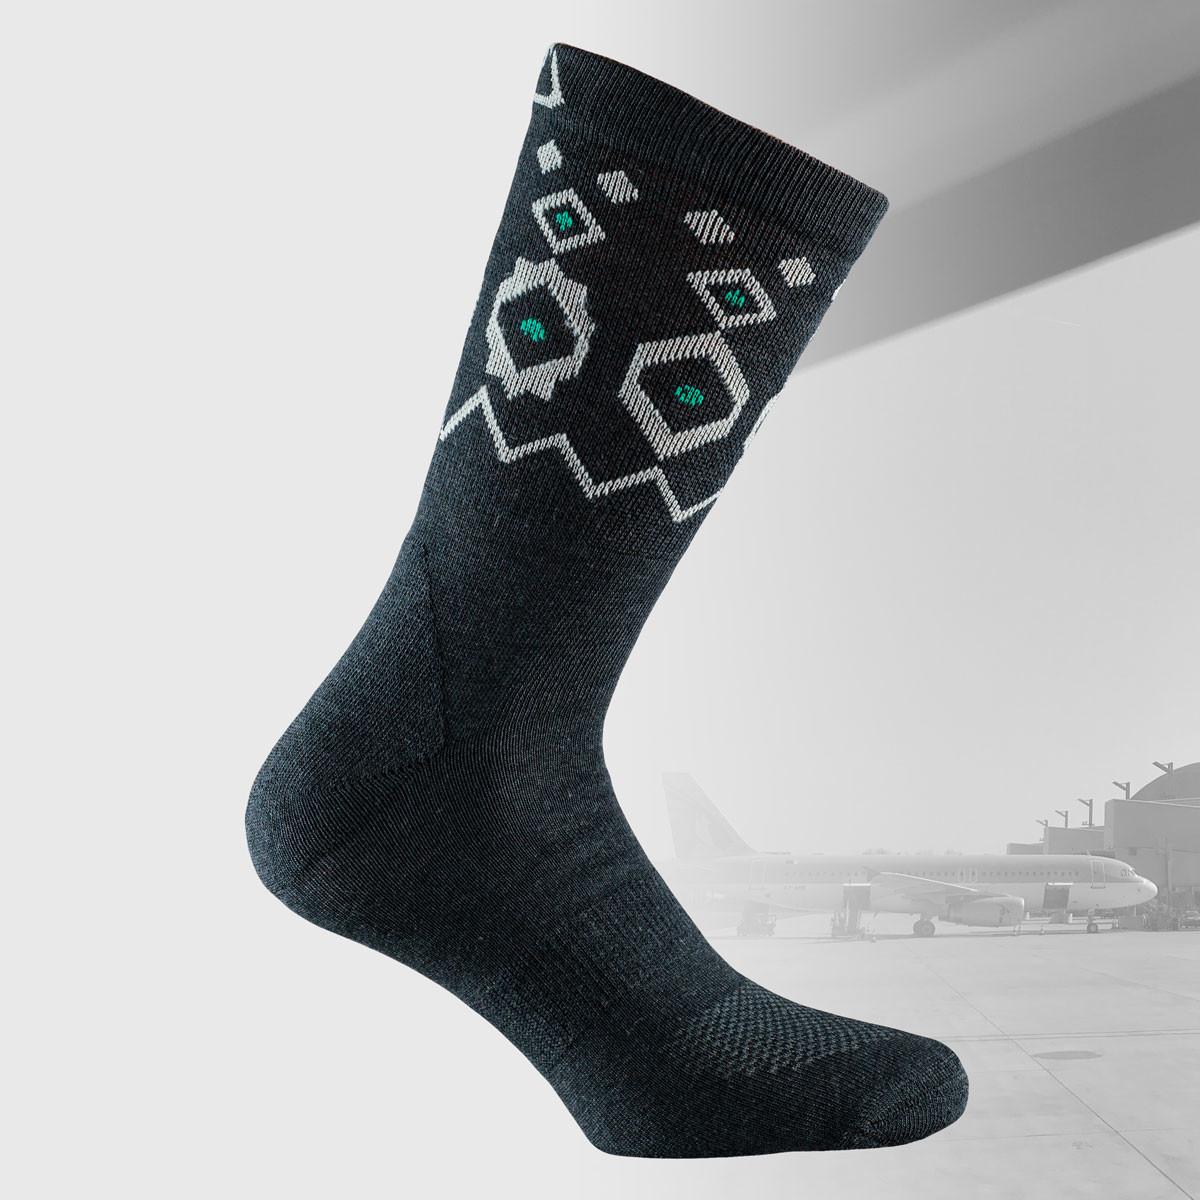 travel socks in black color with nordic design